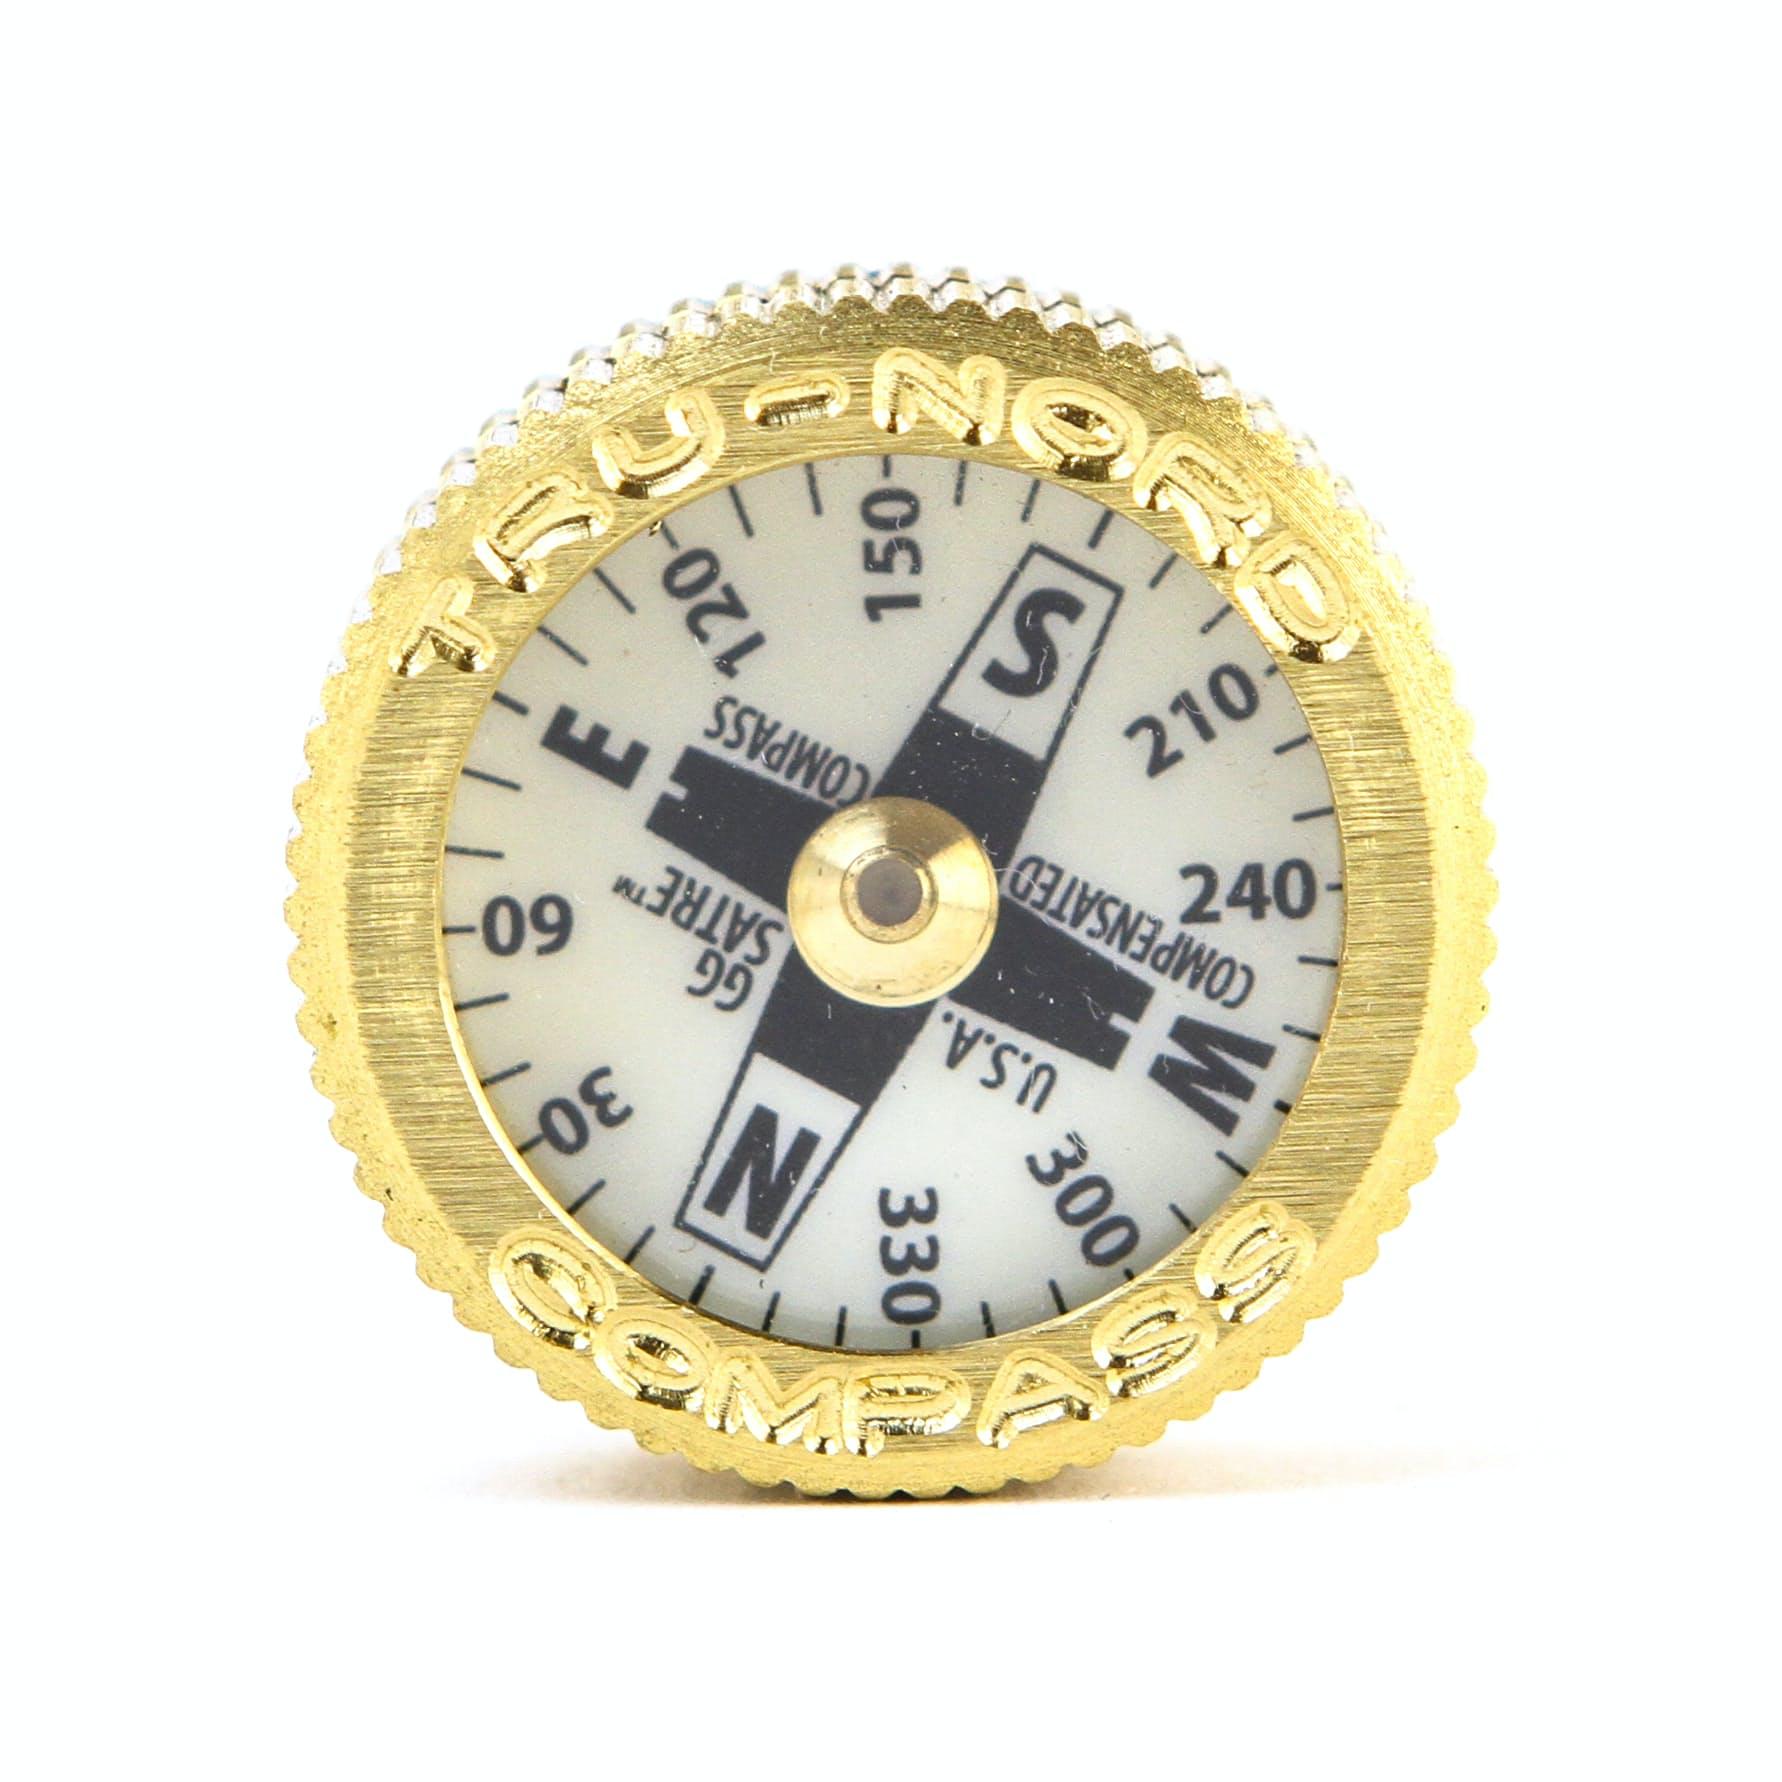 Kow8spuimw tru nord pocket compass 0 original